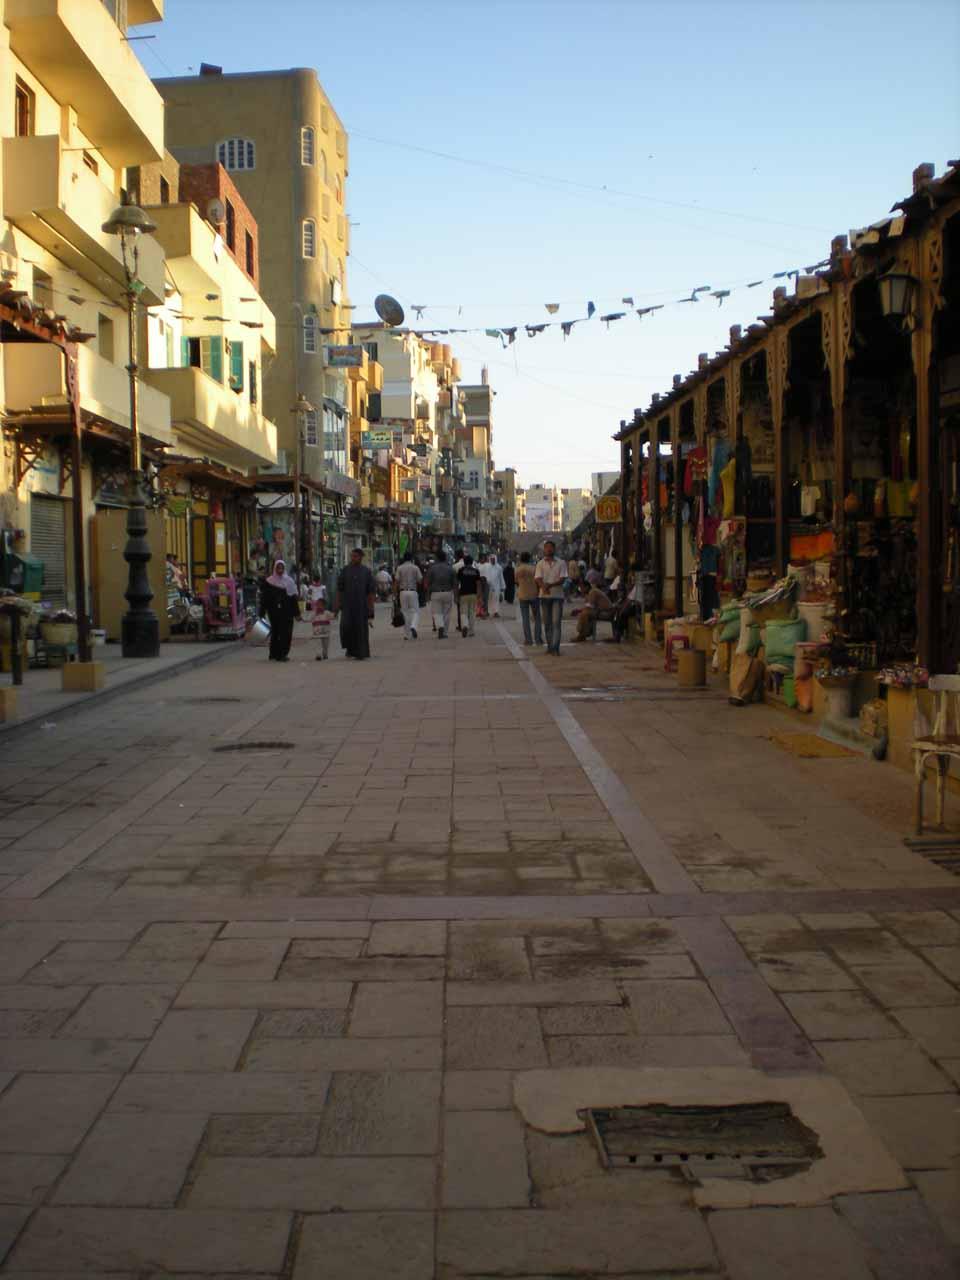 The bazaar in Aswan